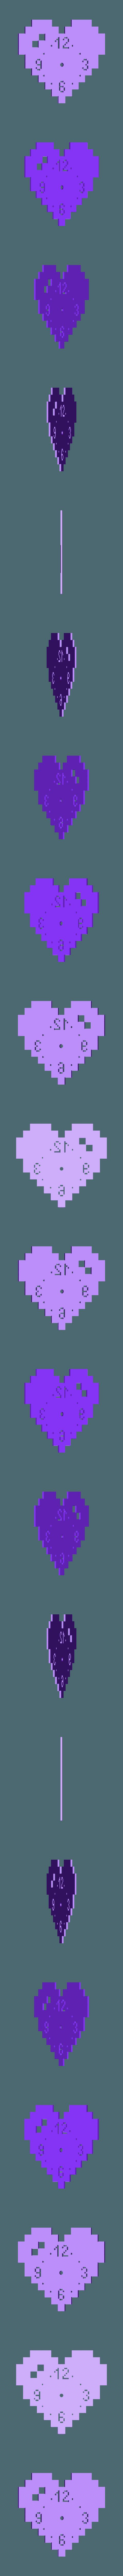 PixelHeartWallClock2.stl Download free STL file Pixel Heart Wall Clock • 3D printing model, Xenice